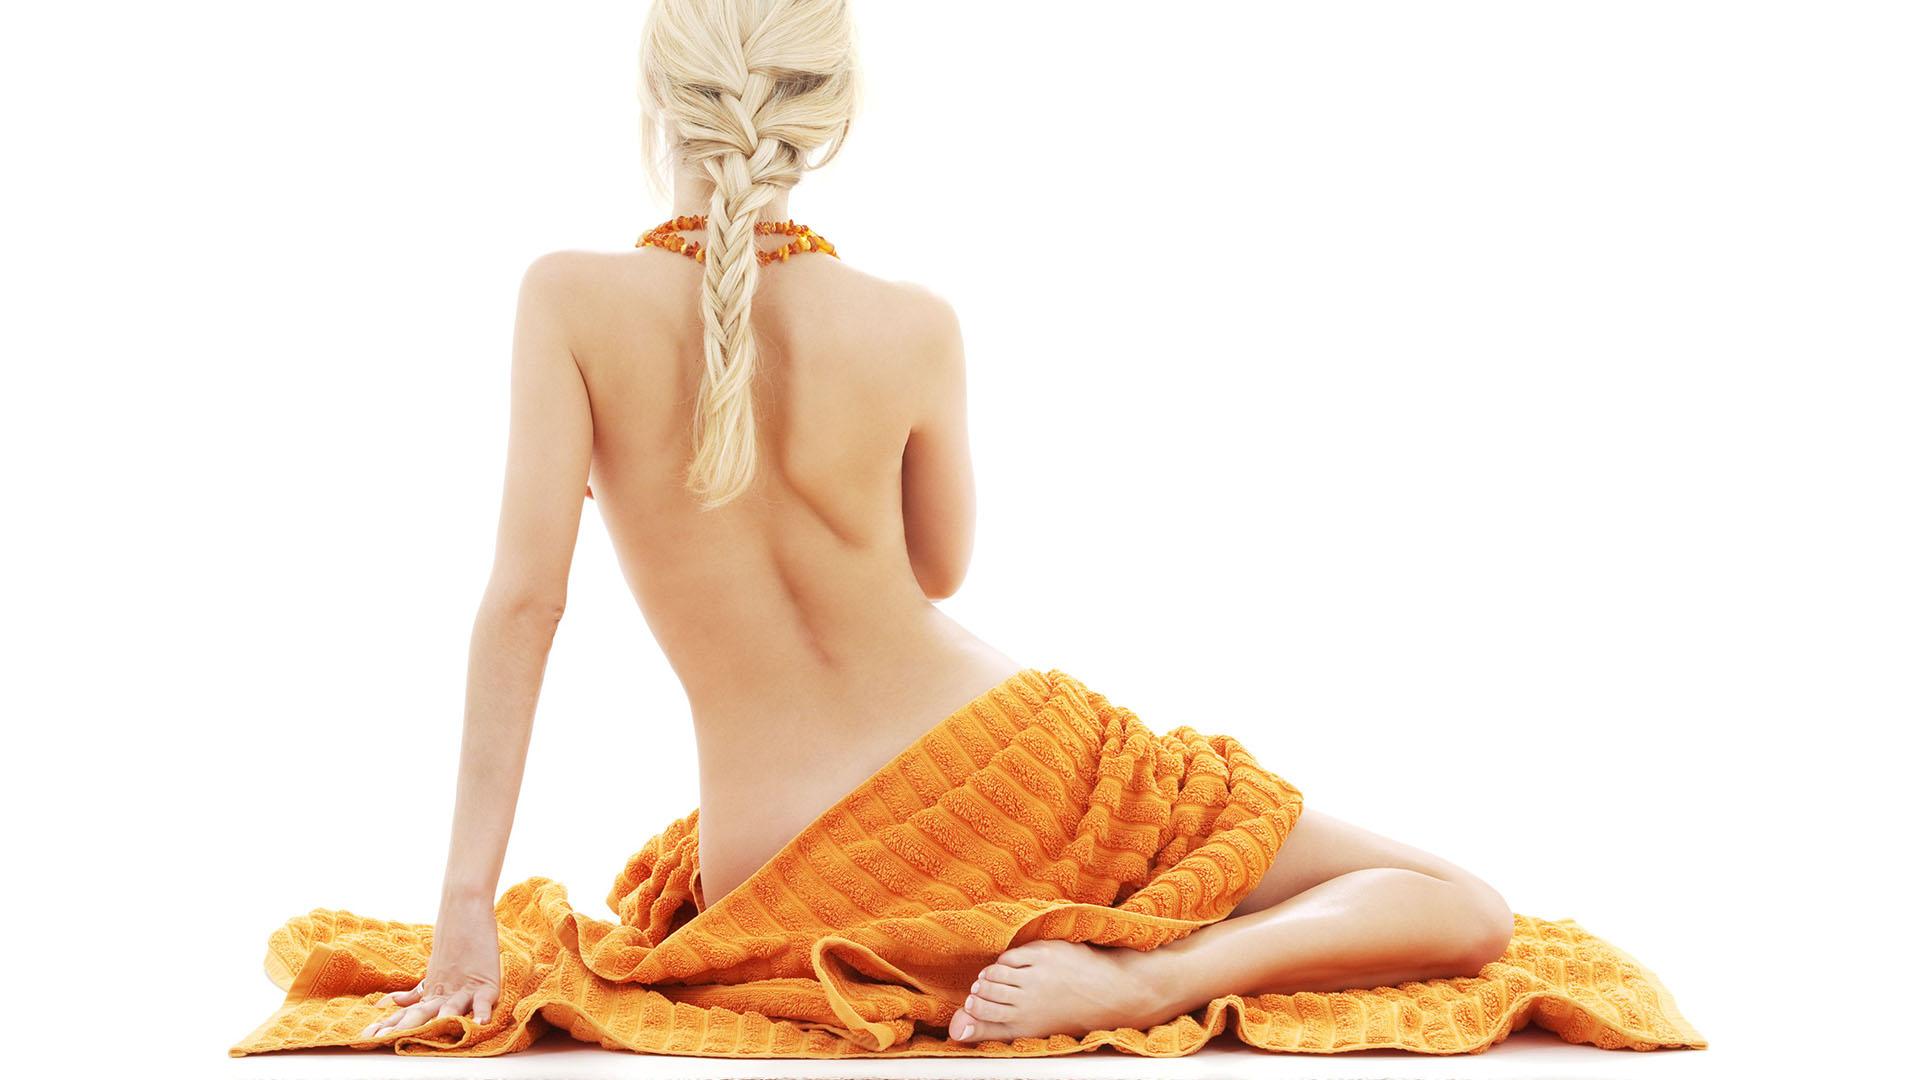 Девушка в огромном полотенце